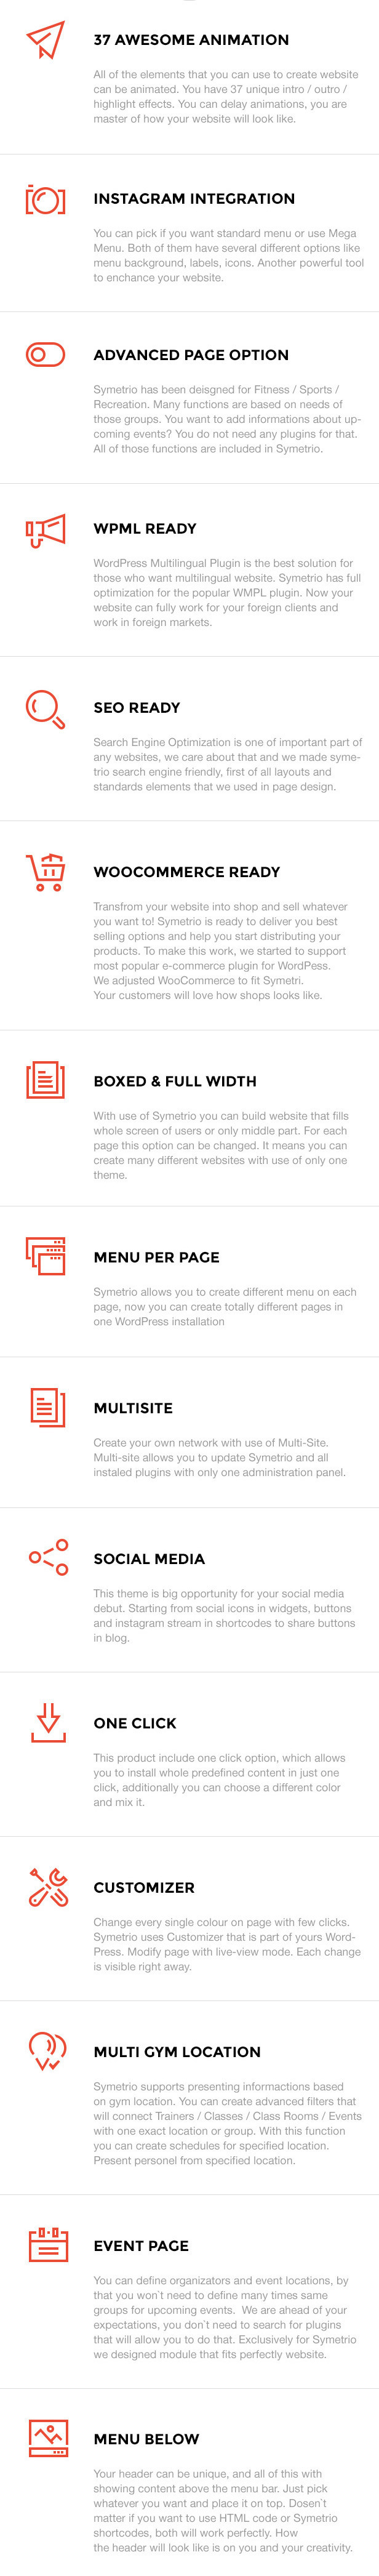 Symetrio - سمة WordPress للجيم واللياقة البدنية - 5